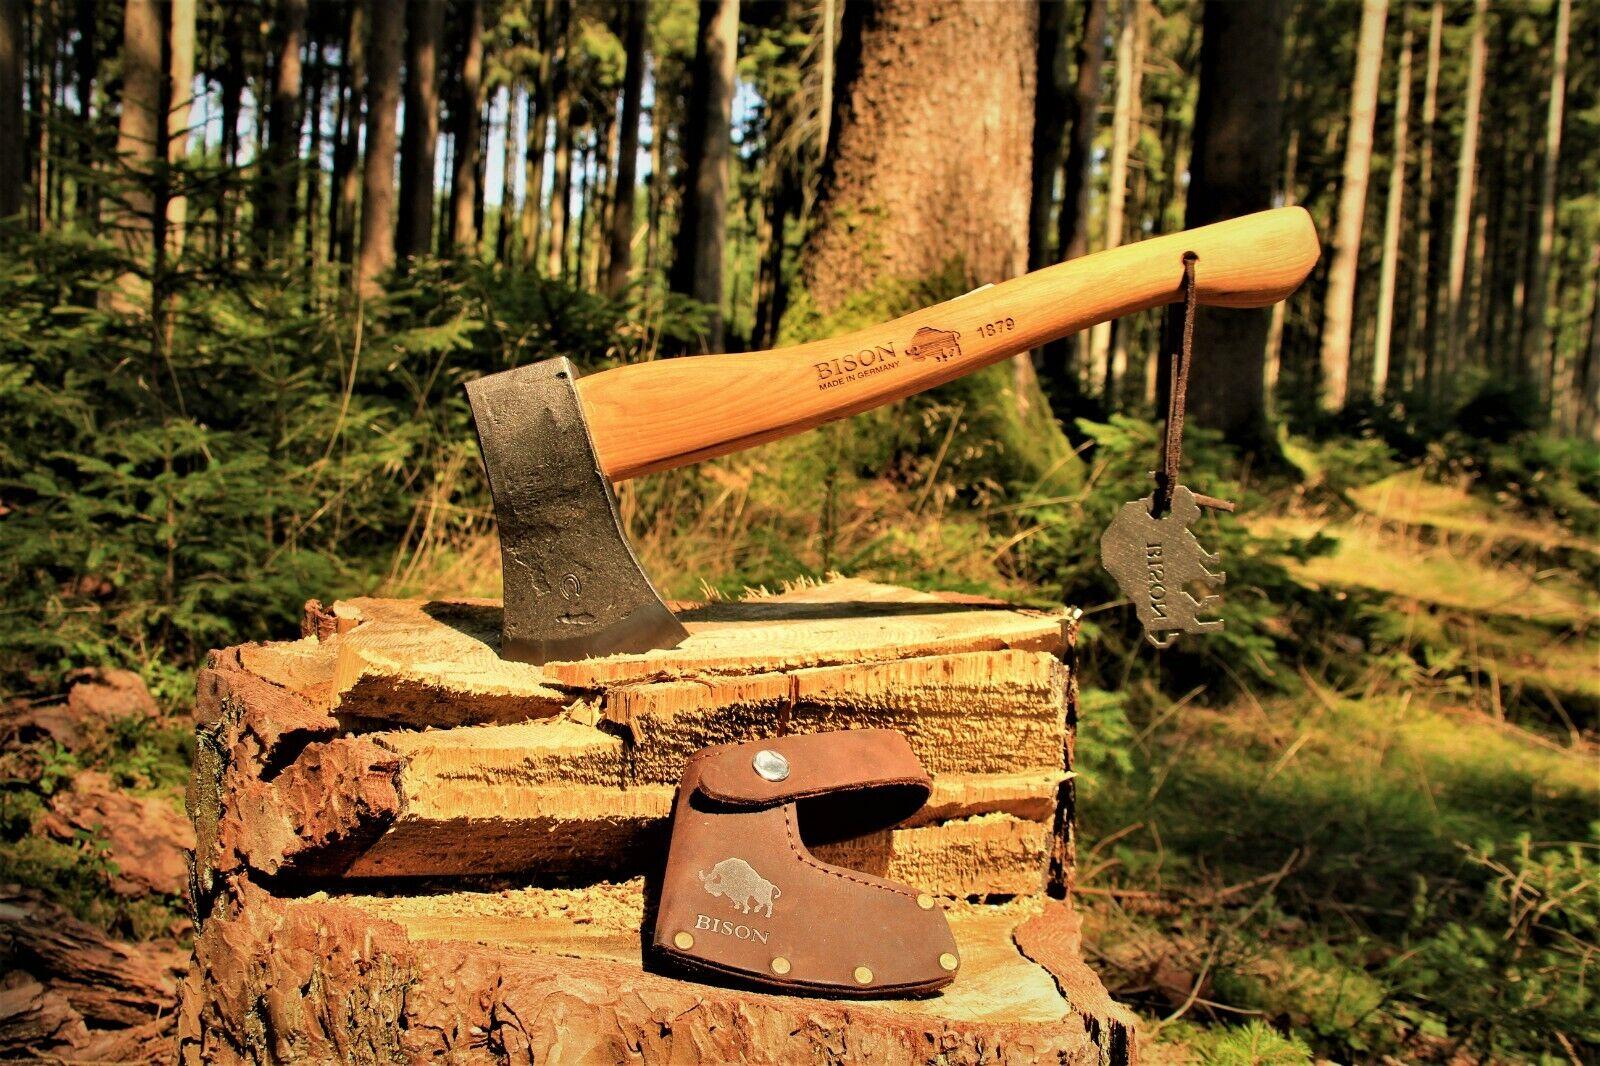 Handgeschmiedetes Bison 1879 Outdoorbeil Beil Axt Outdoor Survival Made-in-GER